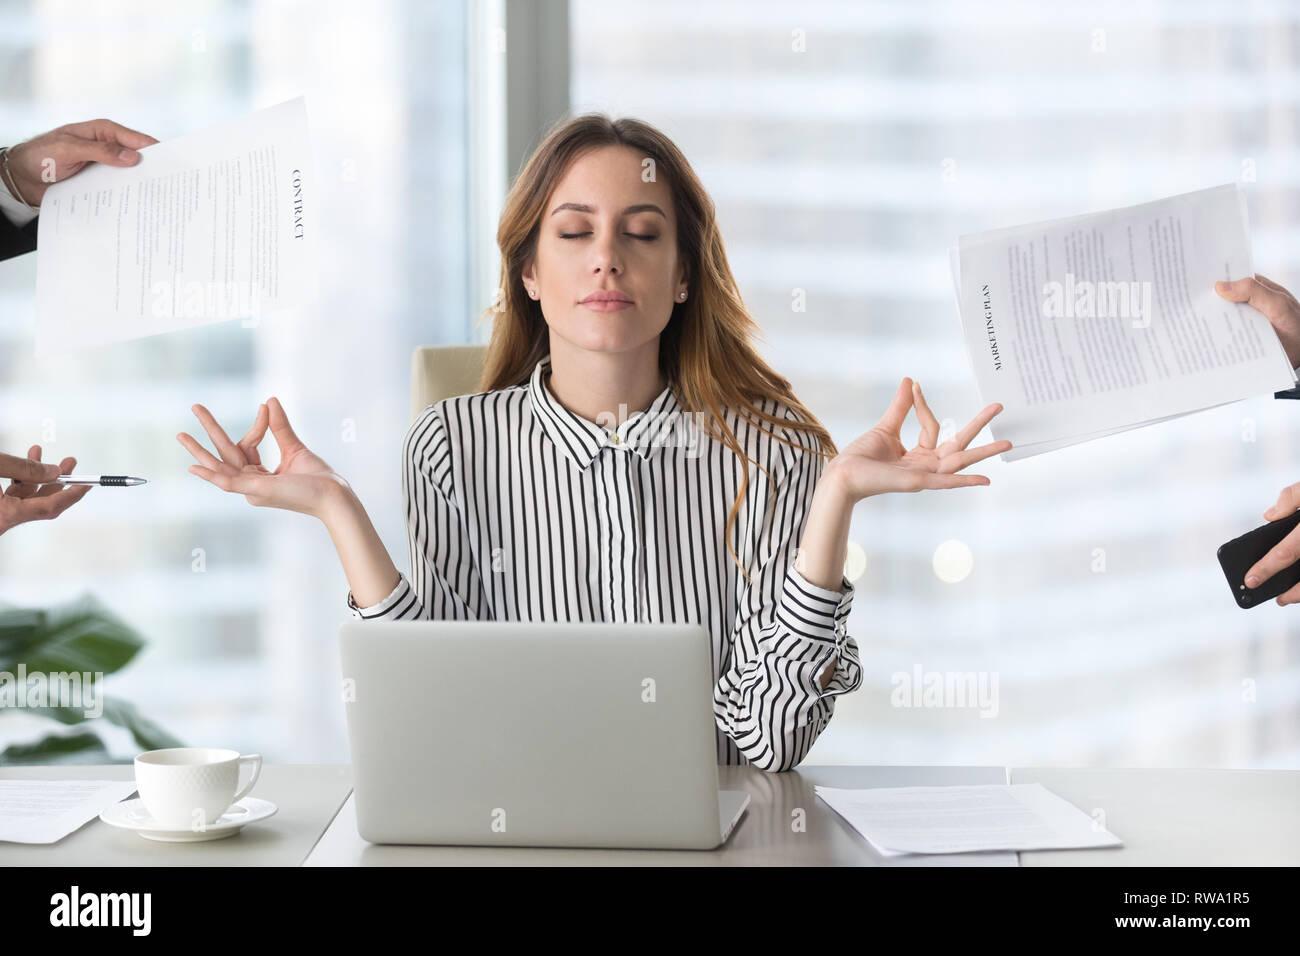 Calm female executive meditating taking break avoiding stressful job - Stock Image